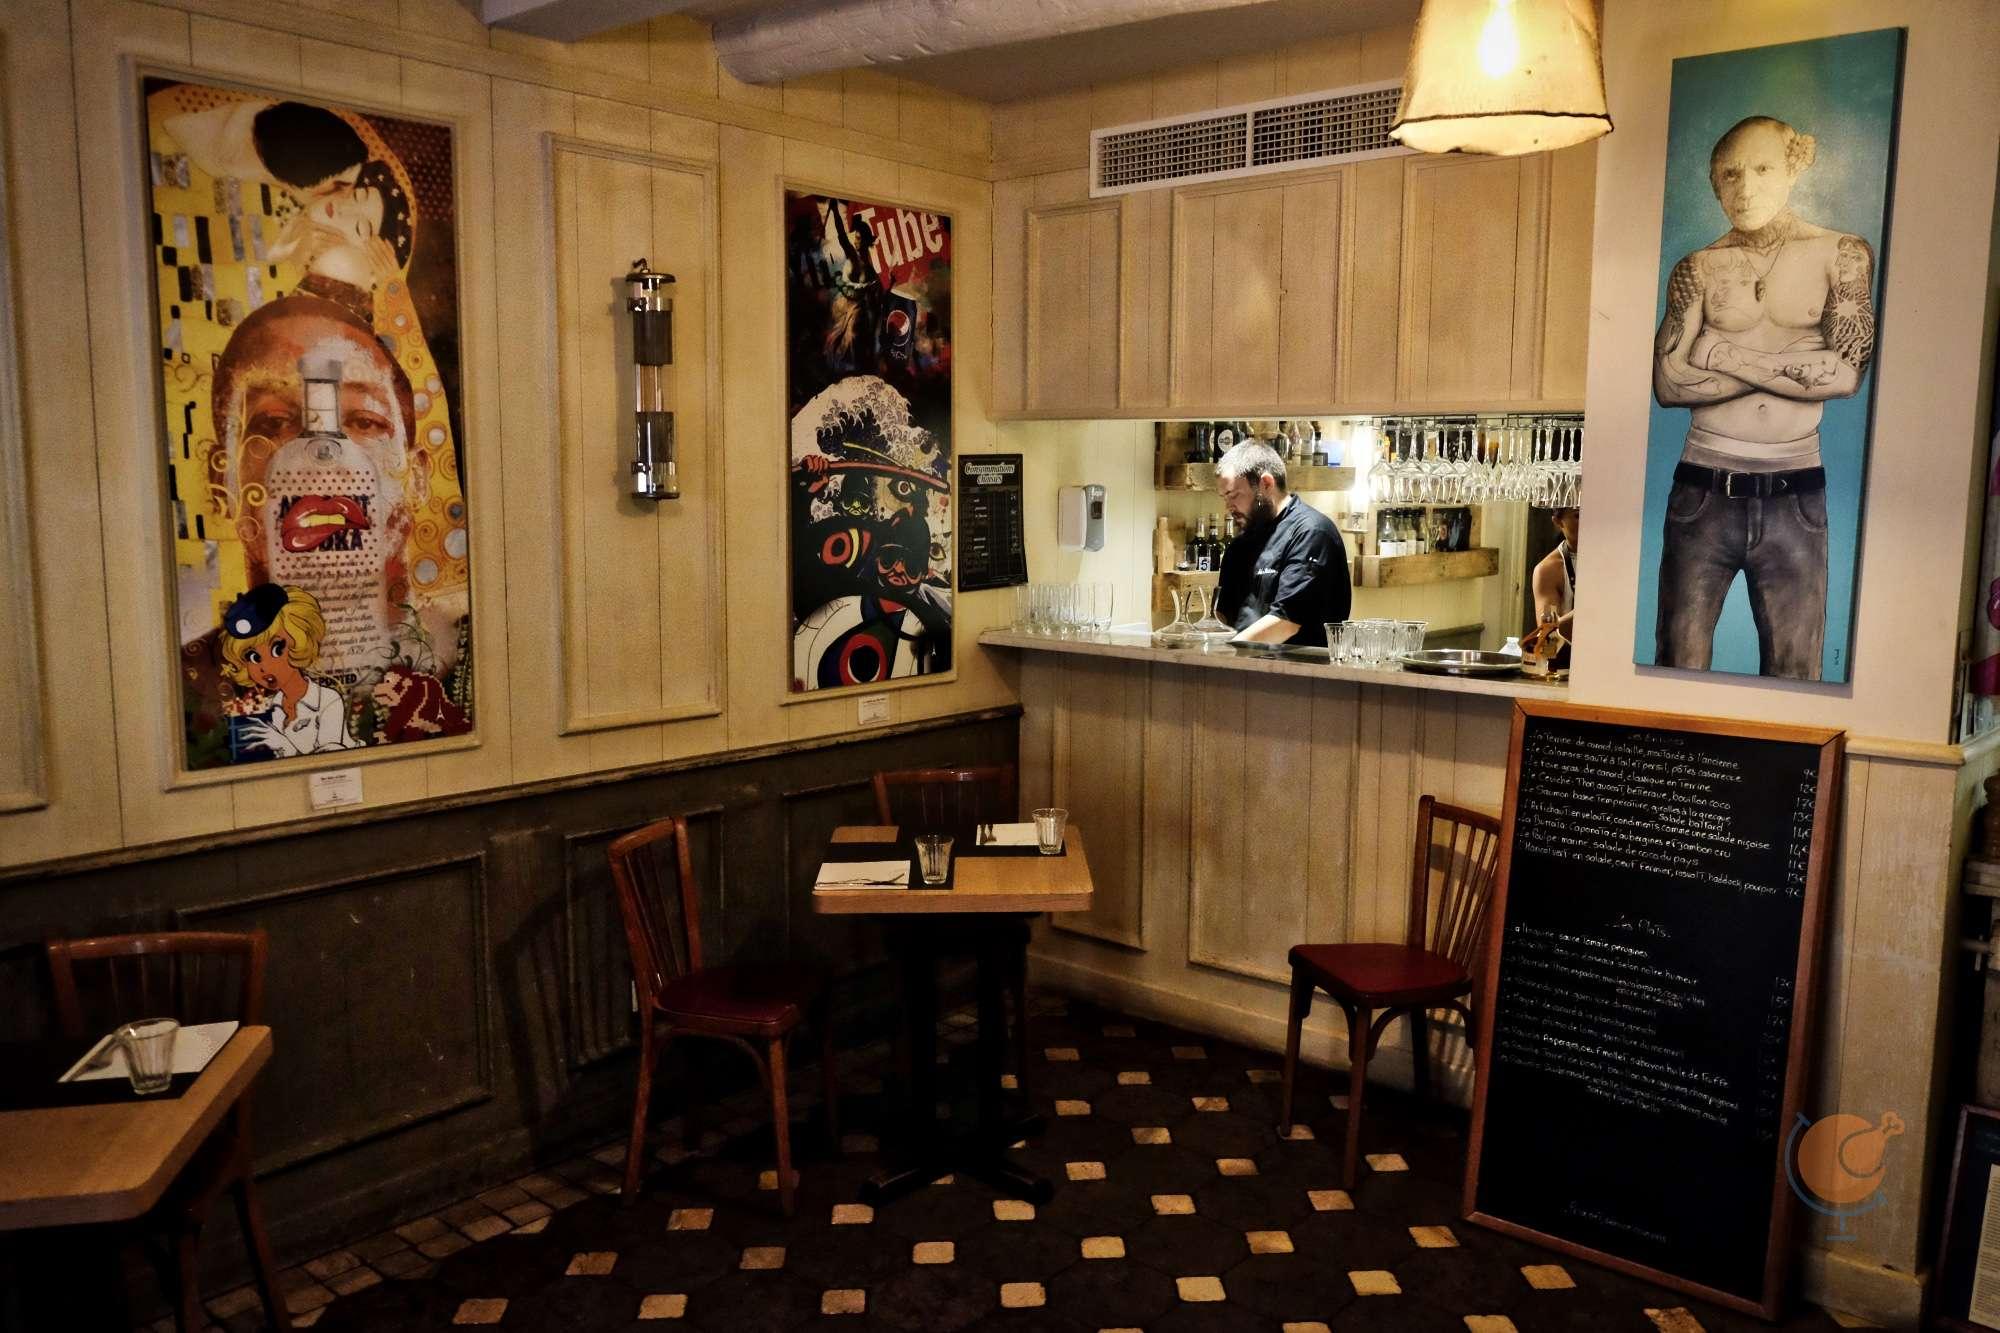 dscf1415_bar_des_oiseaux_restaurant_france_nice_nizza_vilagevo_jokuti_andras_l_w.jpg